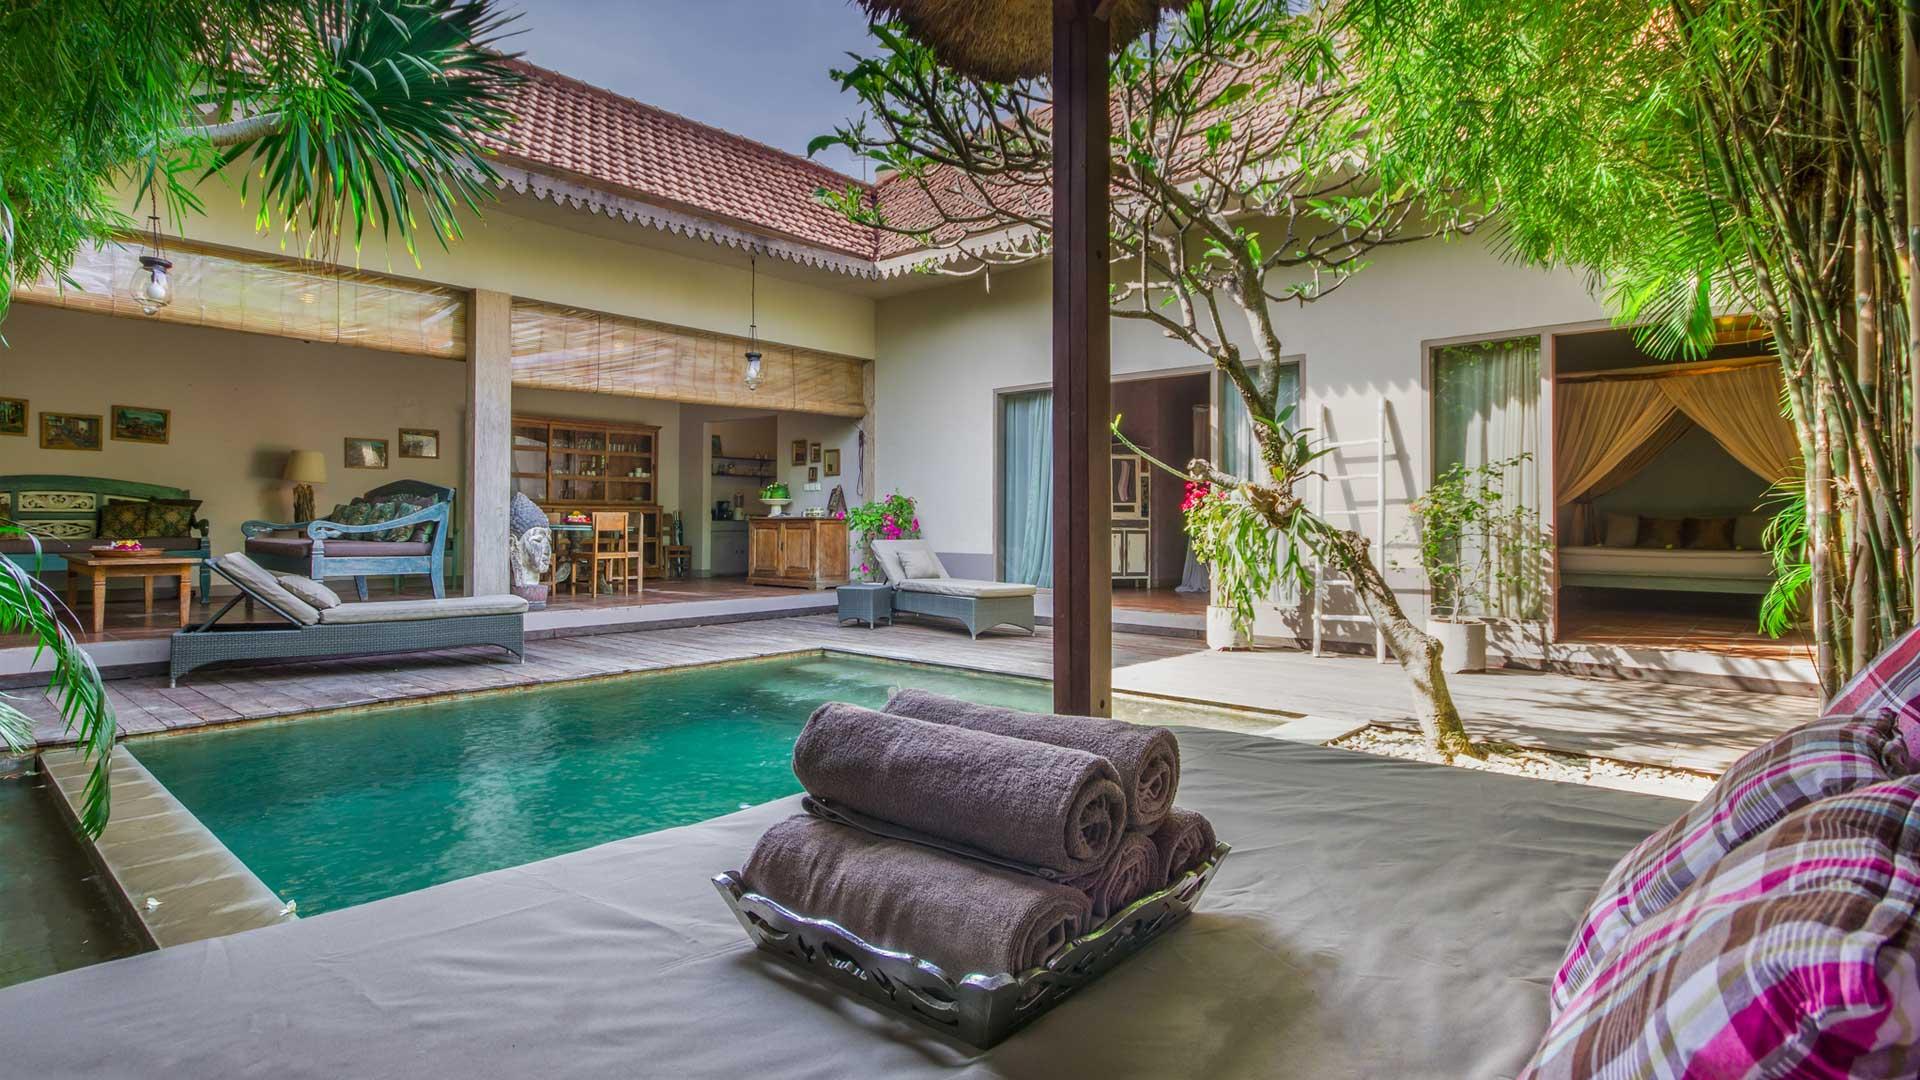 Villa Villa Zenitude, Rental in Bali